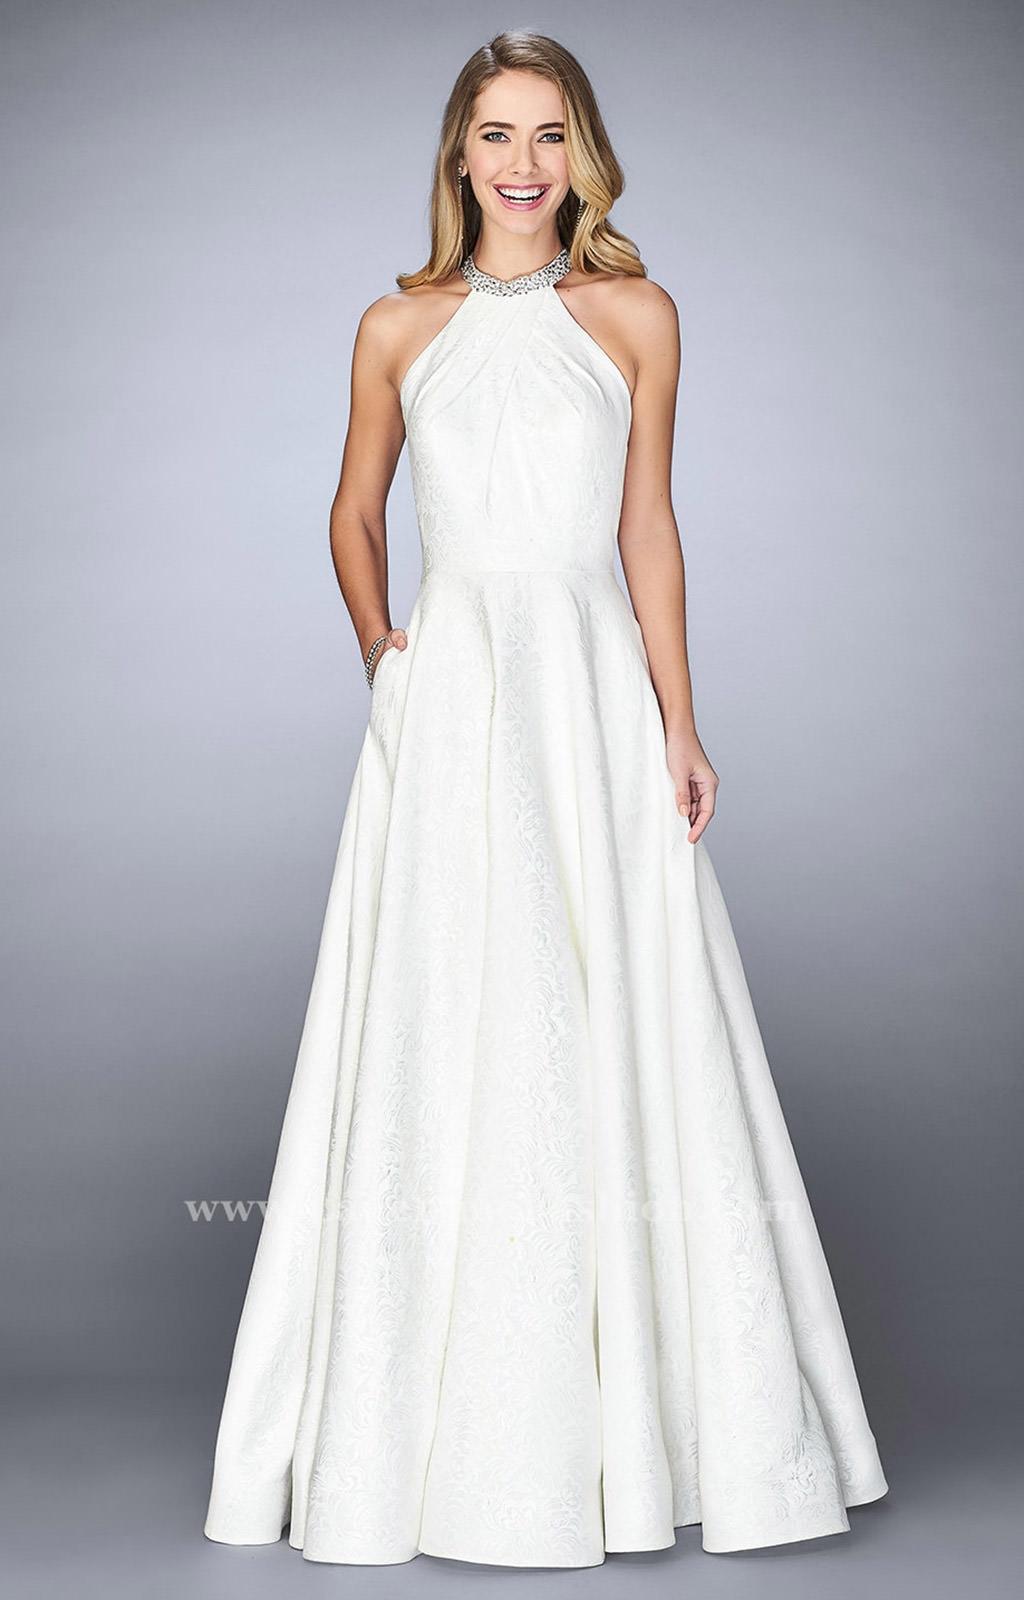 La Femme 24888 Halter Dress With Pockets And A Line